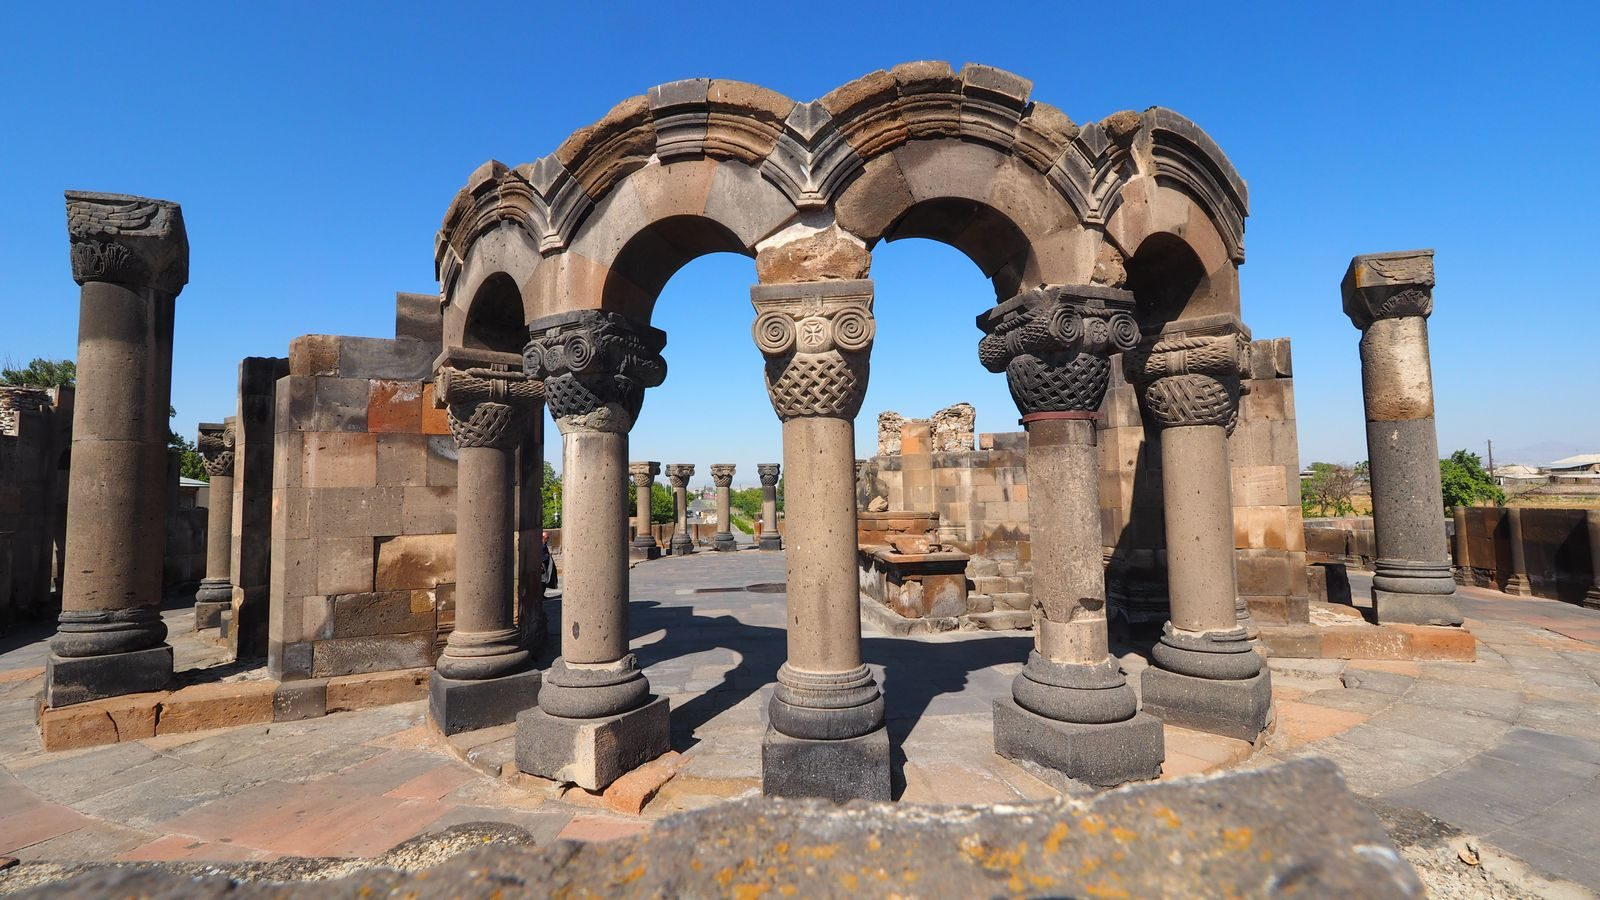 Radreise Armenien - Zvartnots UNESCO-Weltkulturerbe